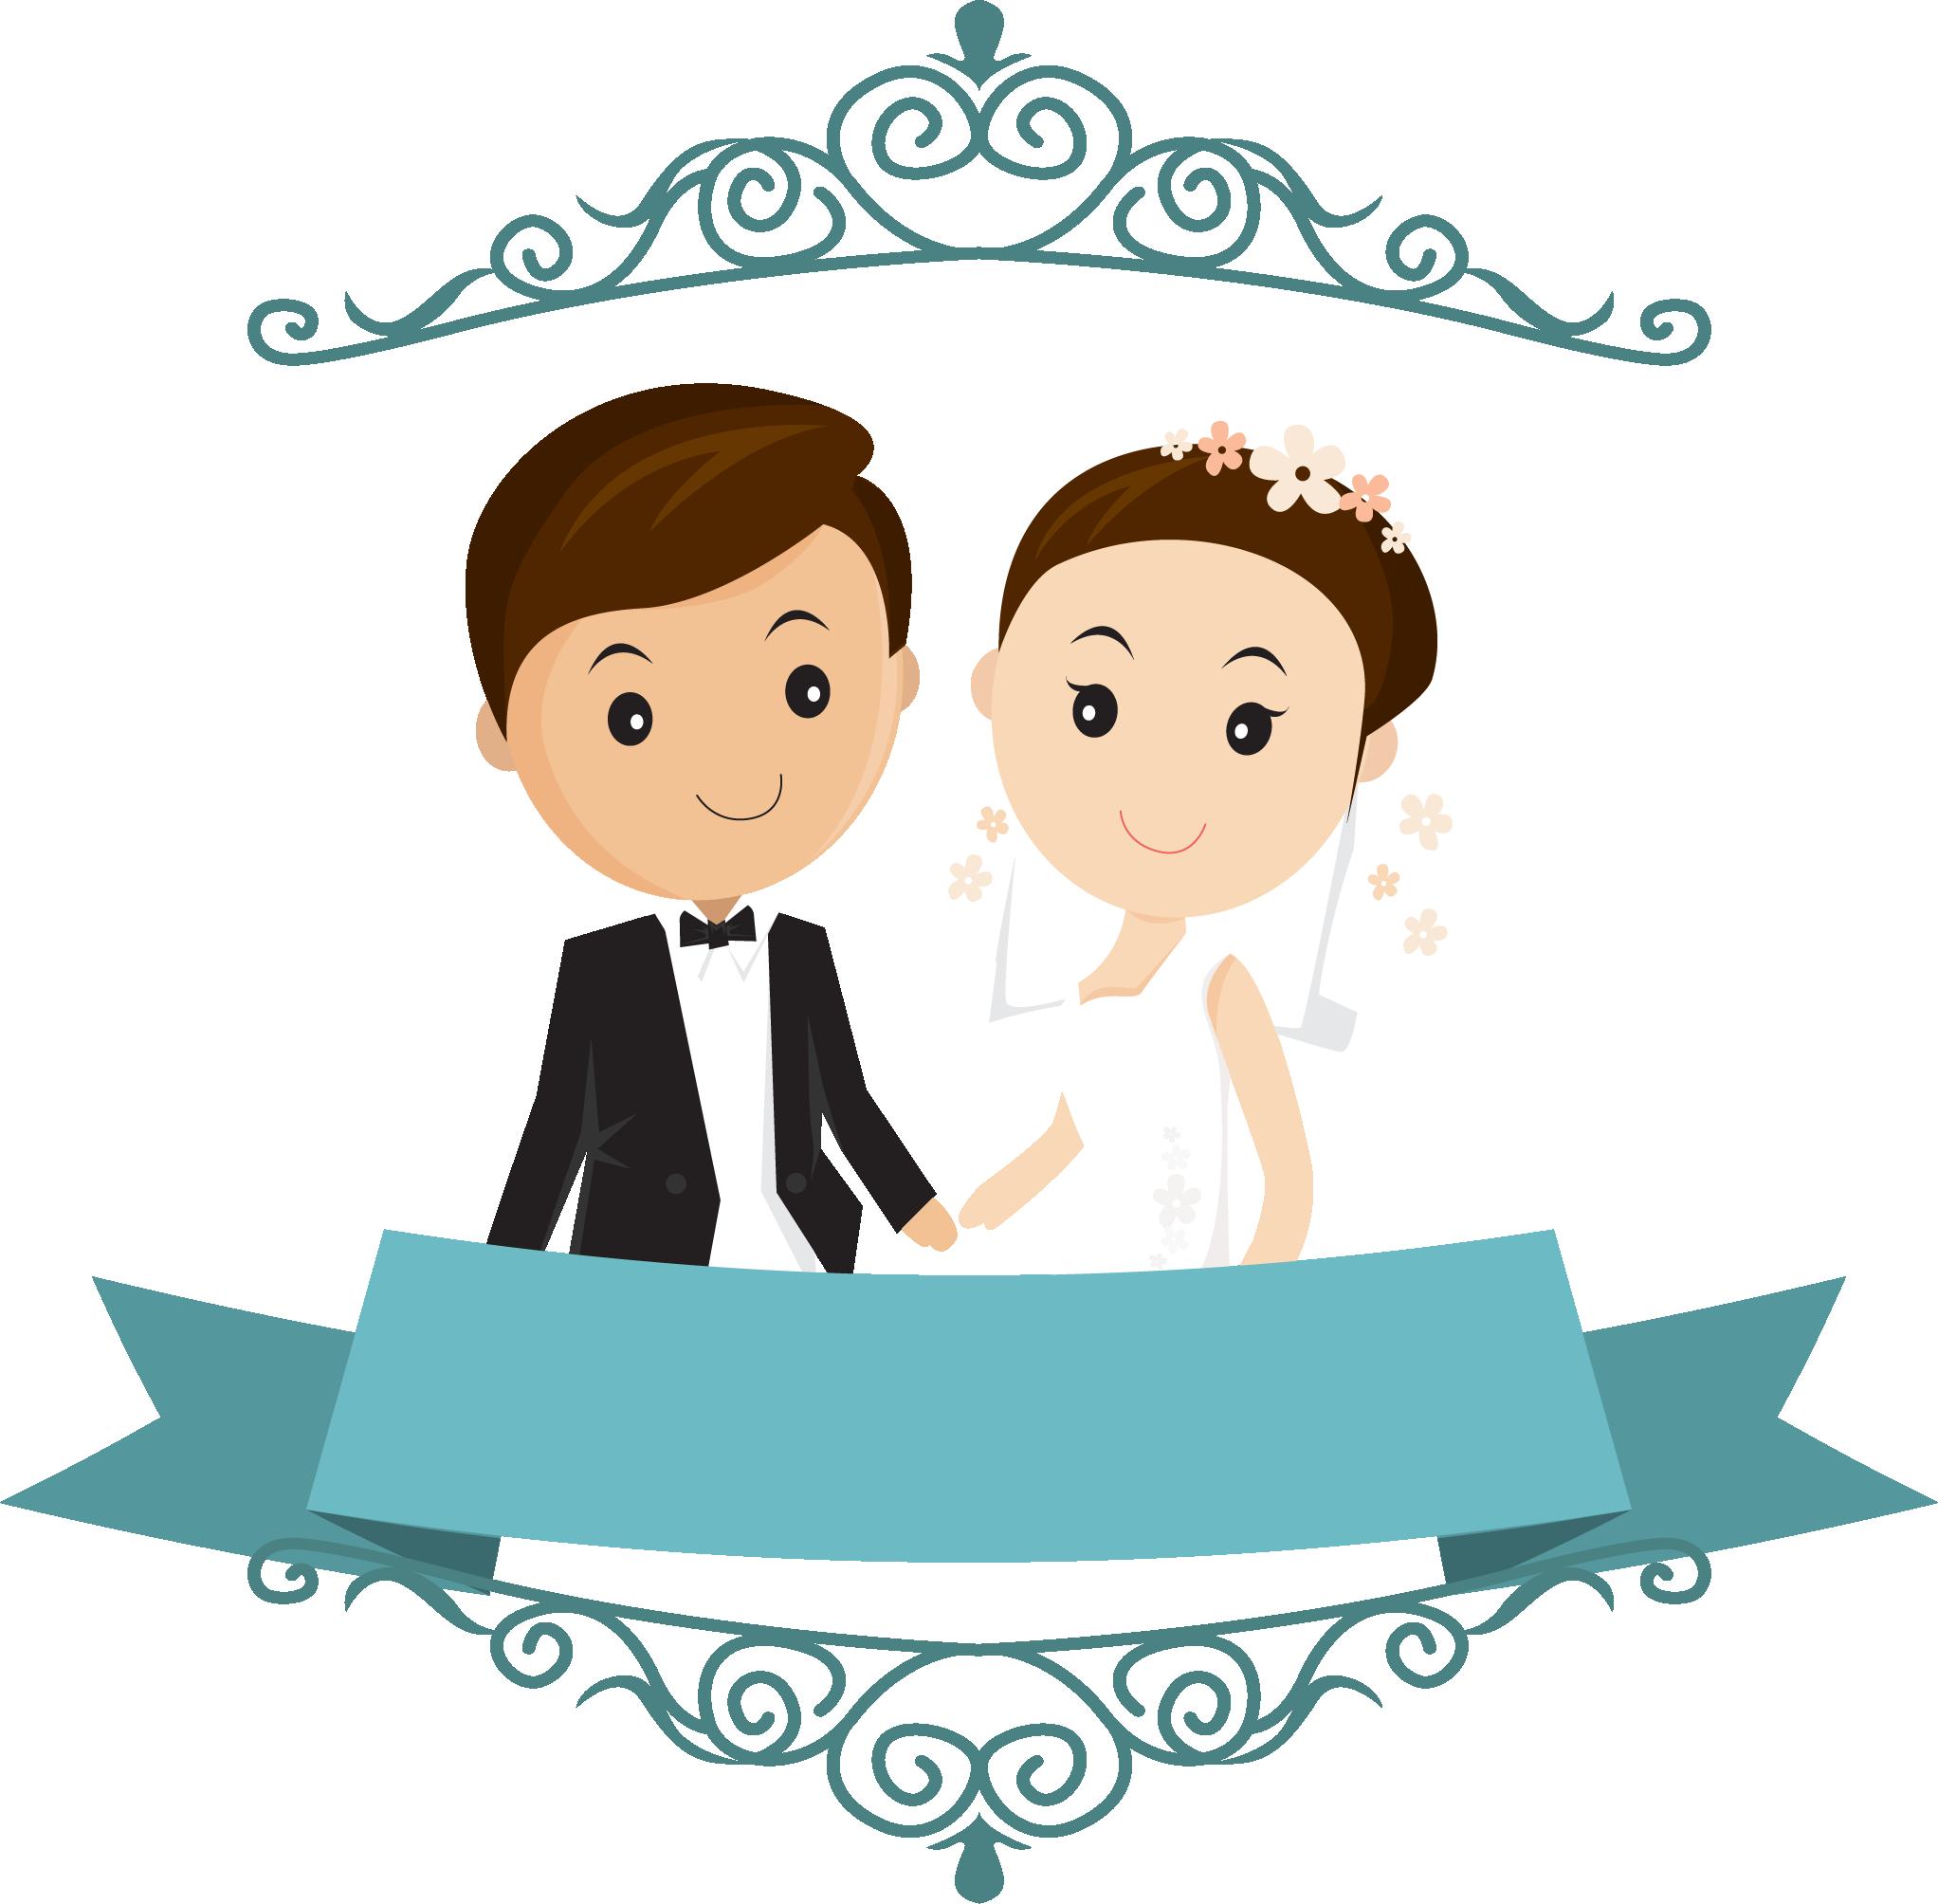 Wedding Free Png Images Wedding Couple Cartoon Png Transparent Cartoon Jing Fm